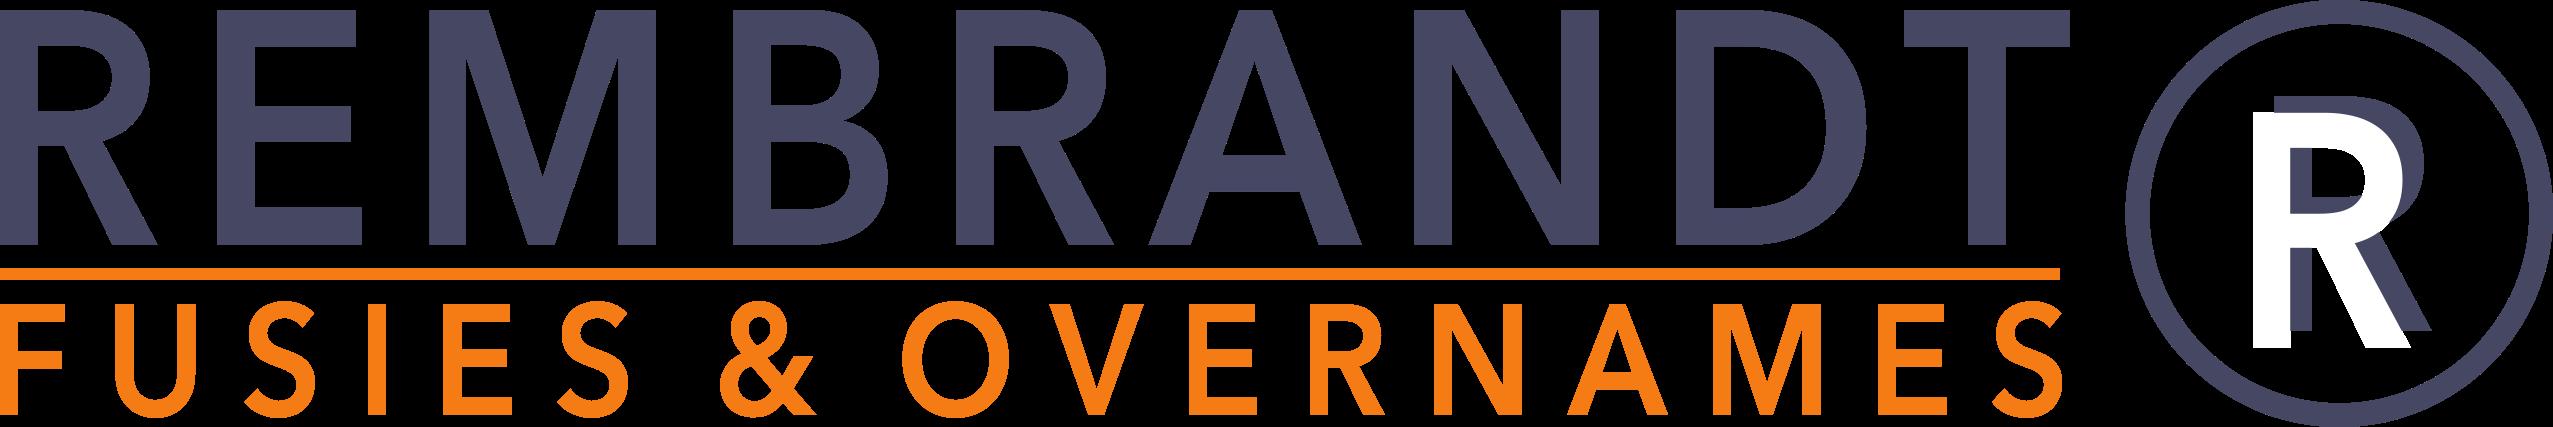 Rembrandt Fusies & Overnames logo